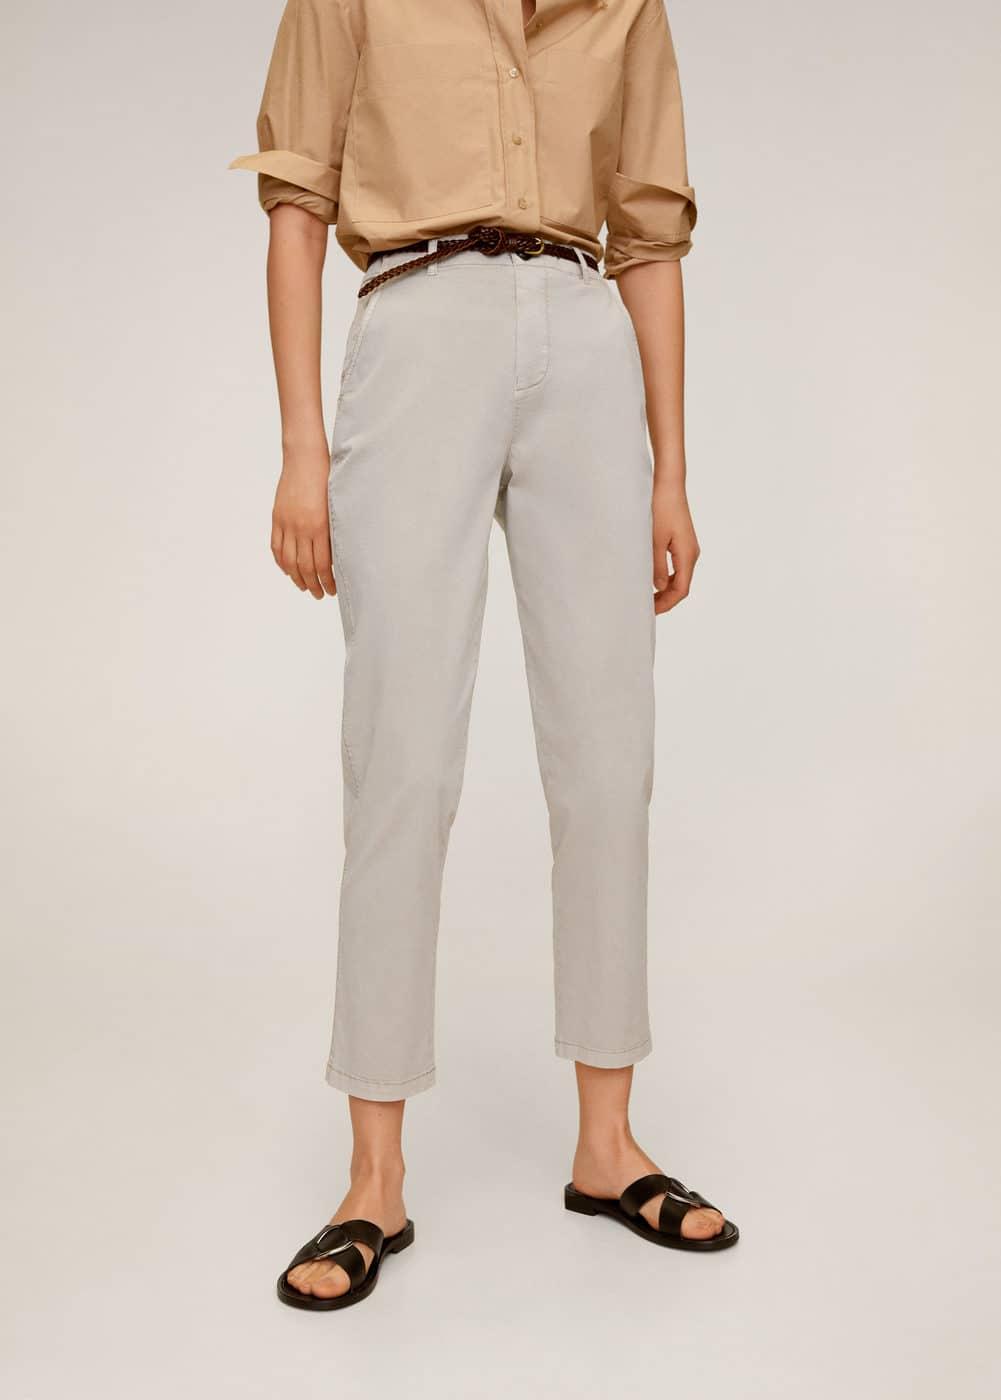 m-chino:pantalon cinturon piel